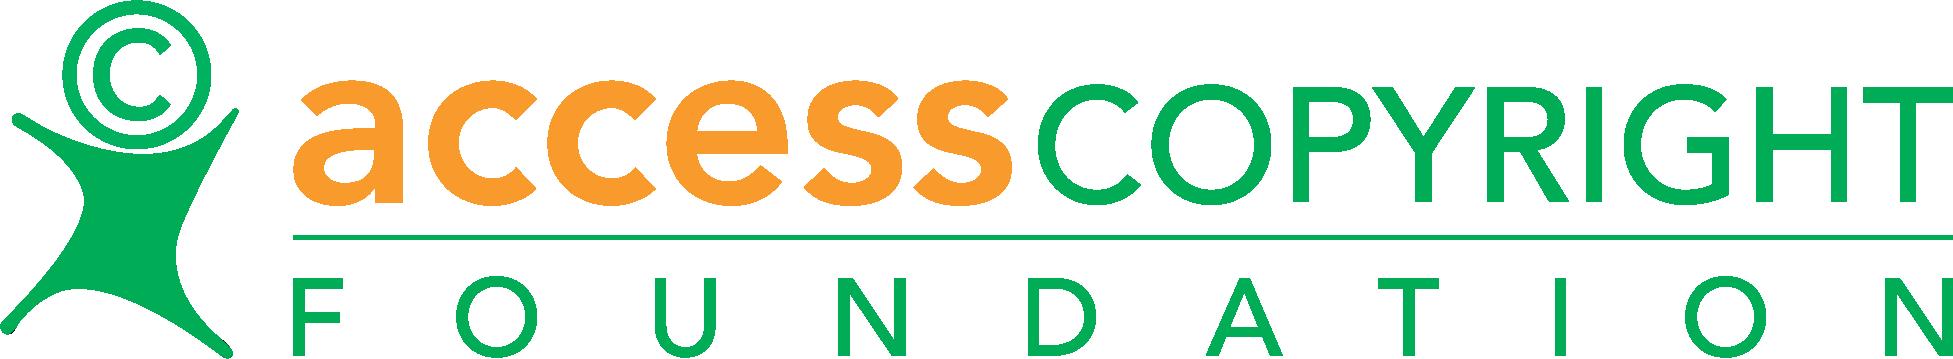 Access Copyright Foundation logo